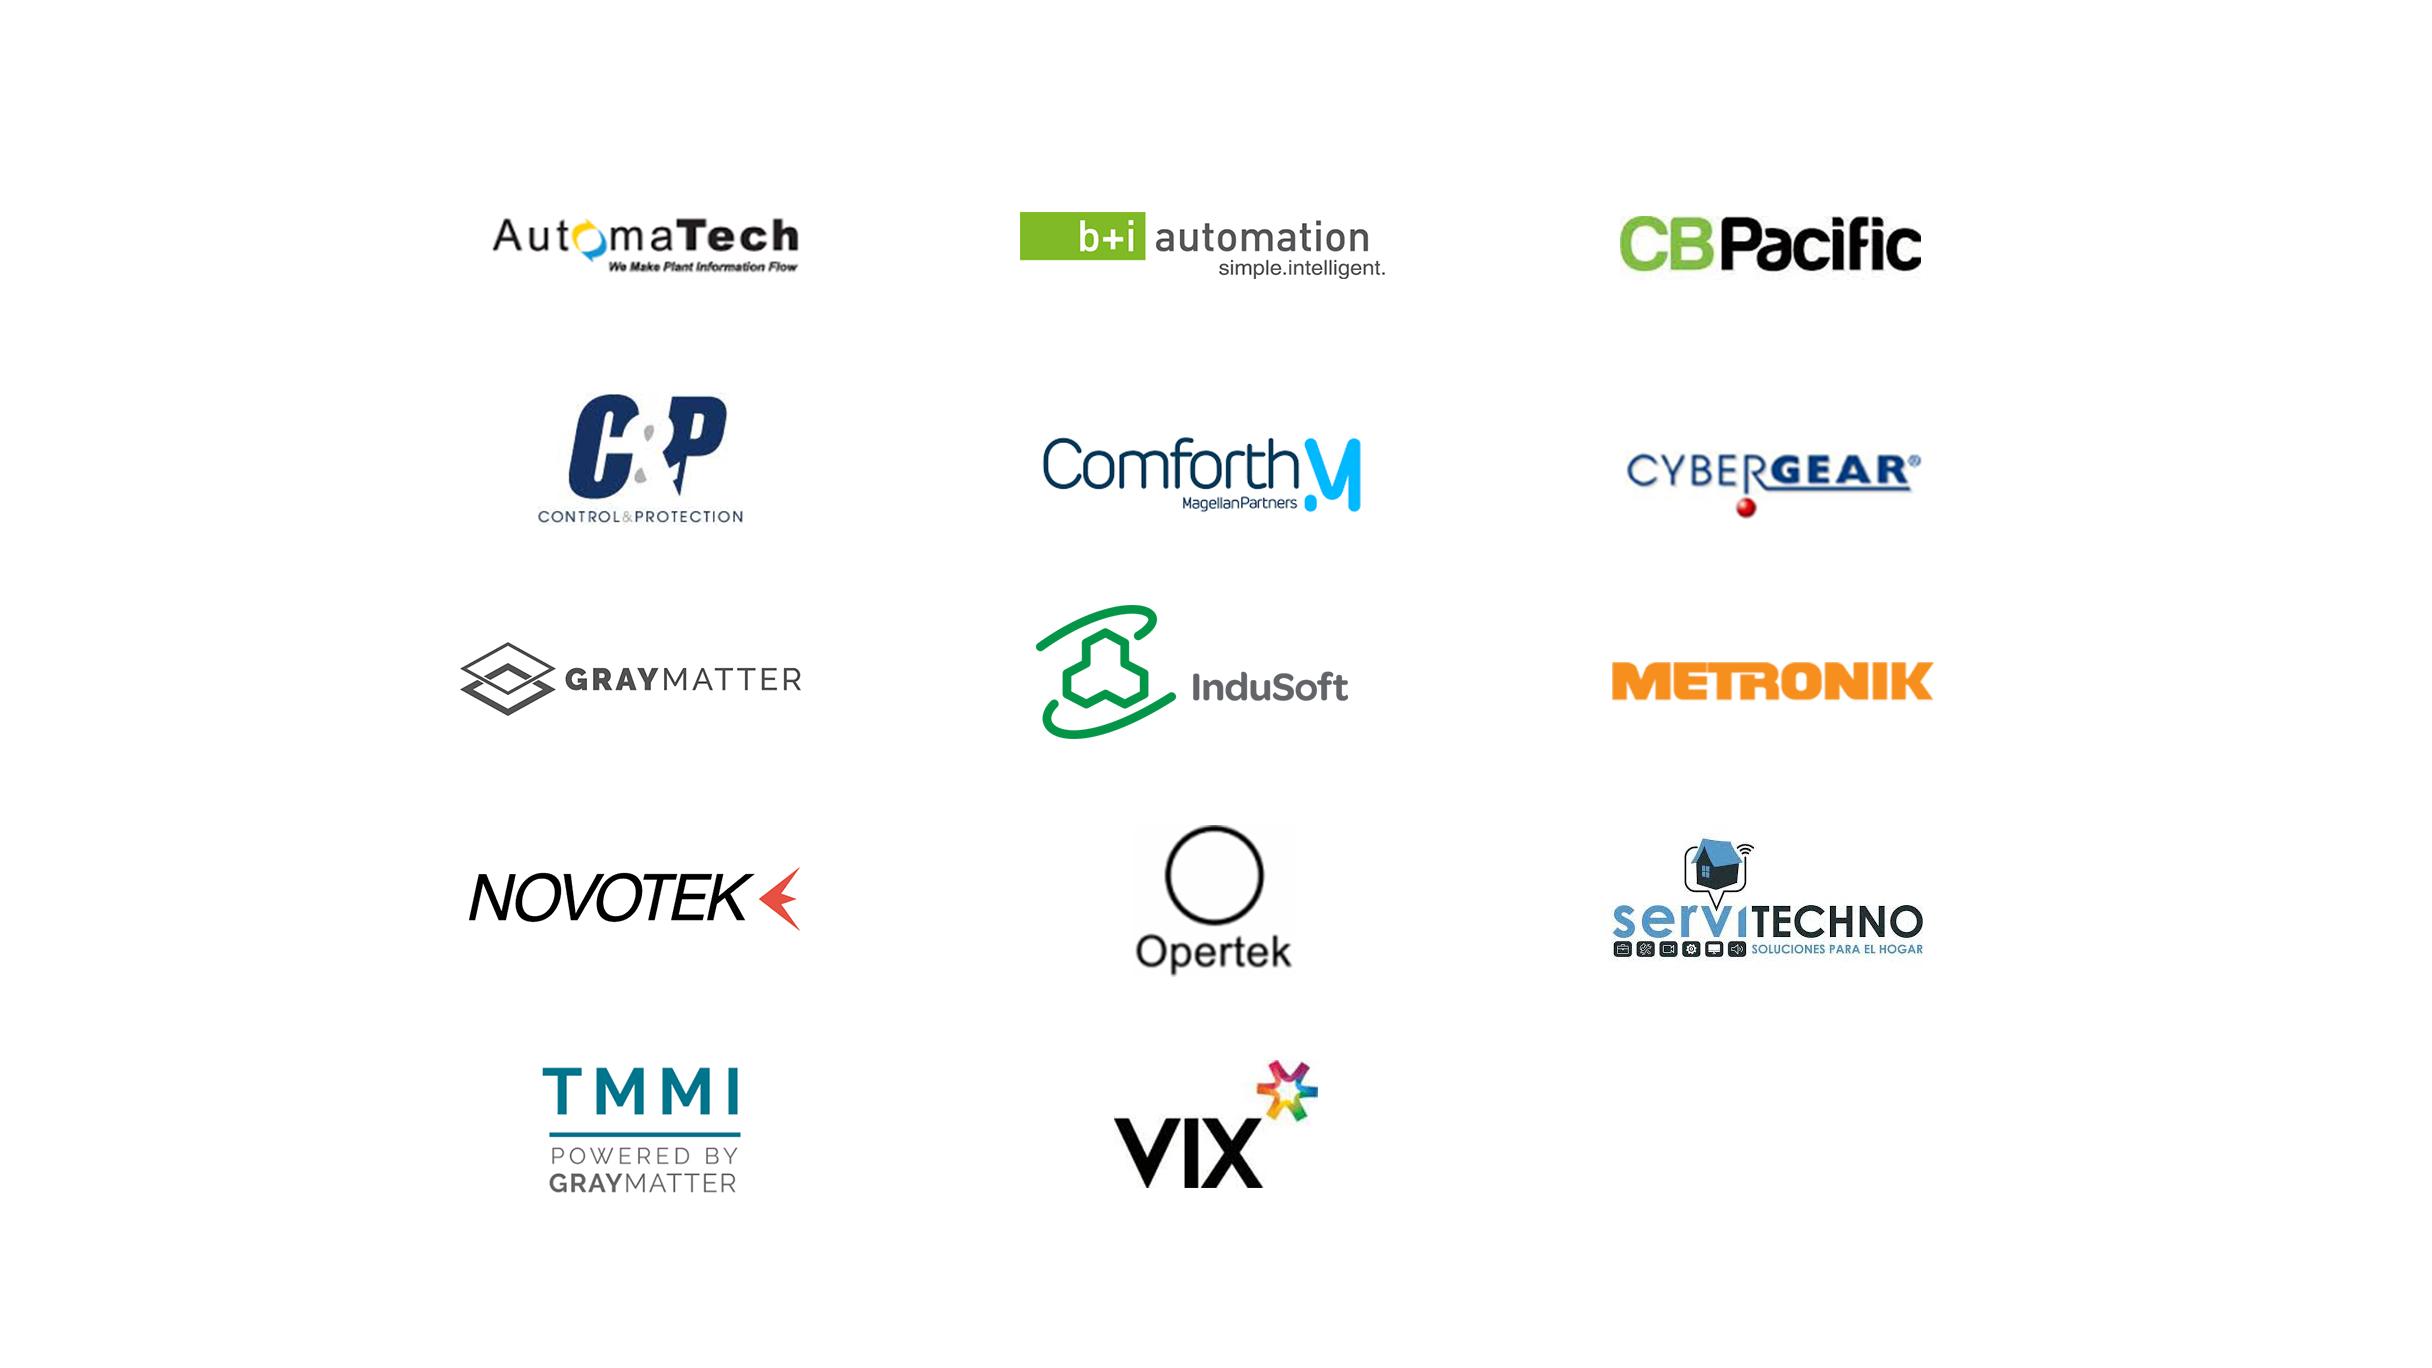 logo-collage-resellers-partners-2432x1368-v2.jpg